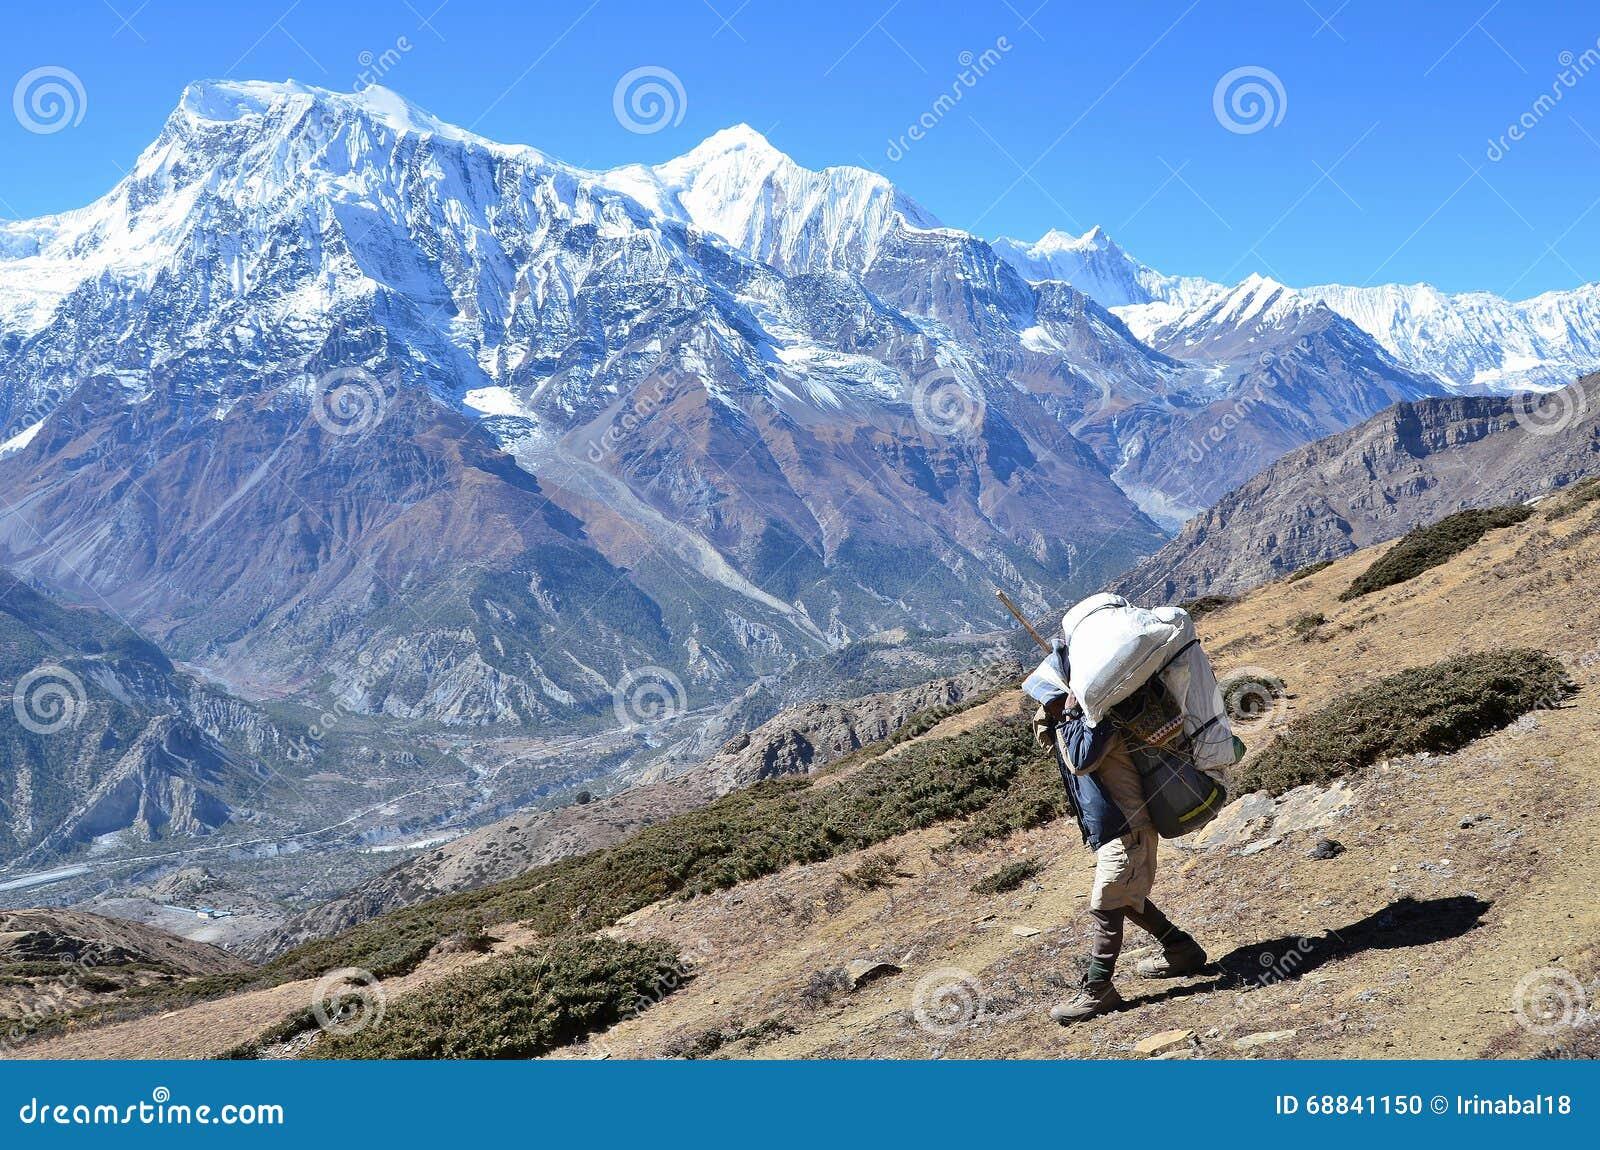 Nepal, Himalayas, November, 04, 2012. Tourist on a mountain trail in Himalayas